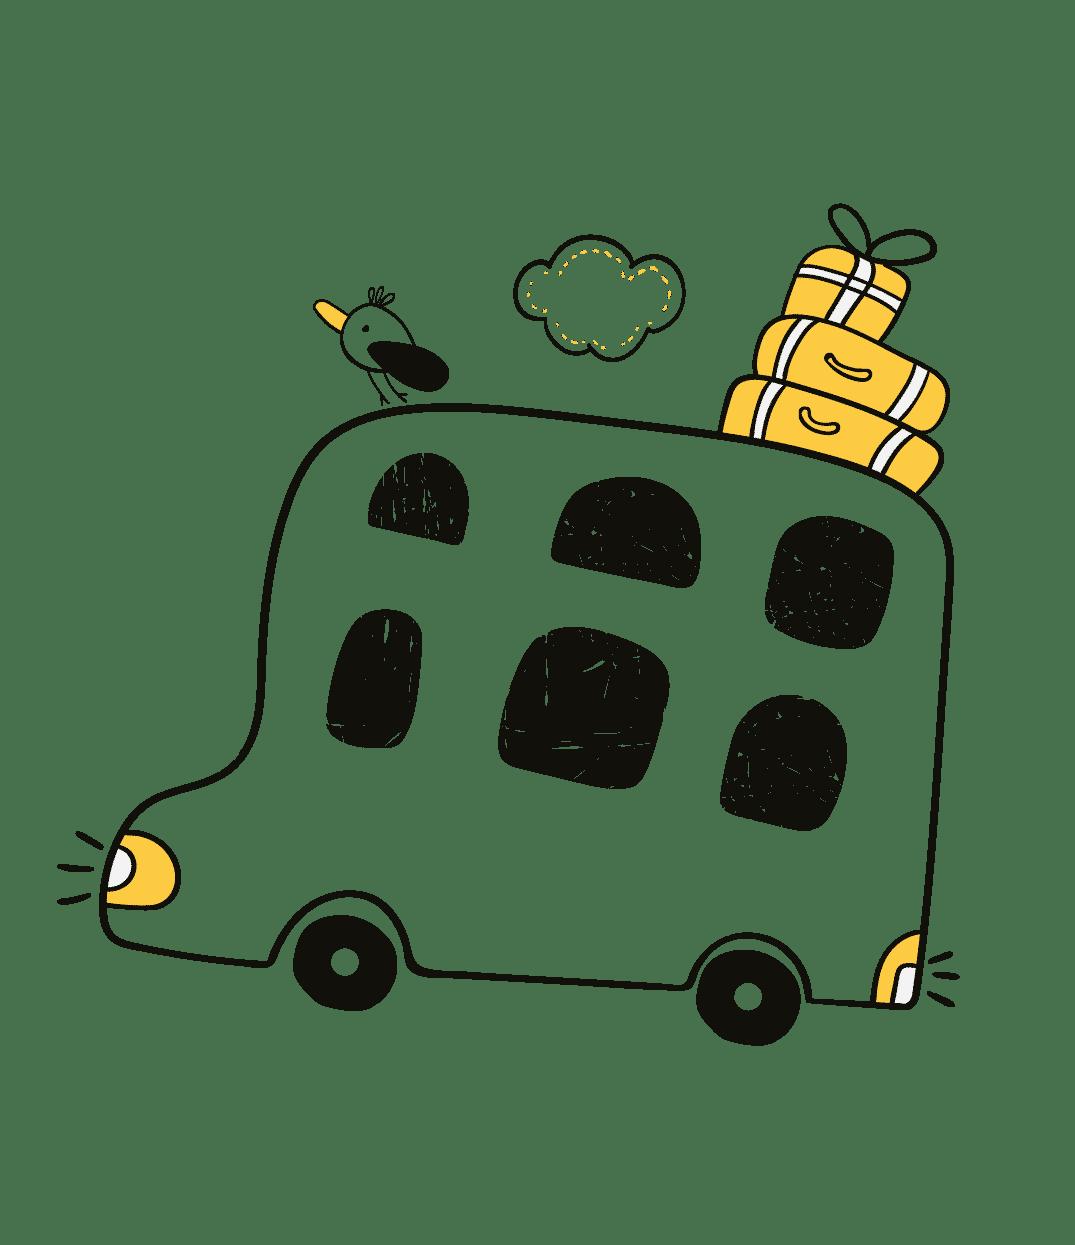 Crypto-bus with critical bird on top